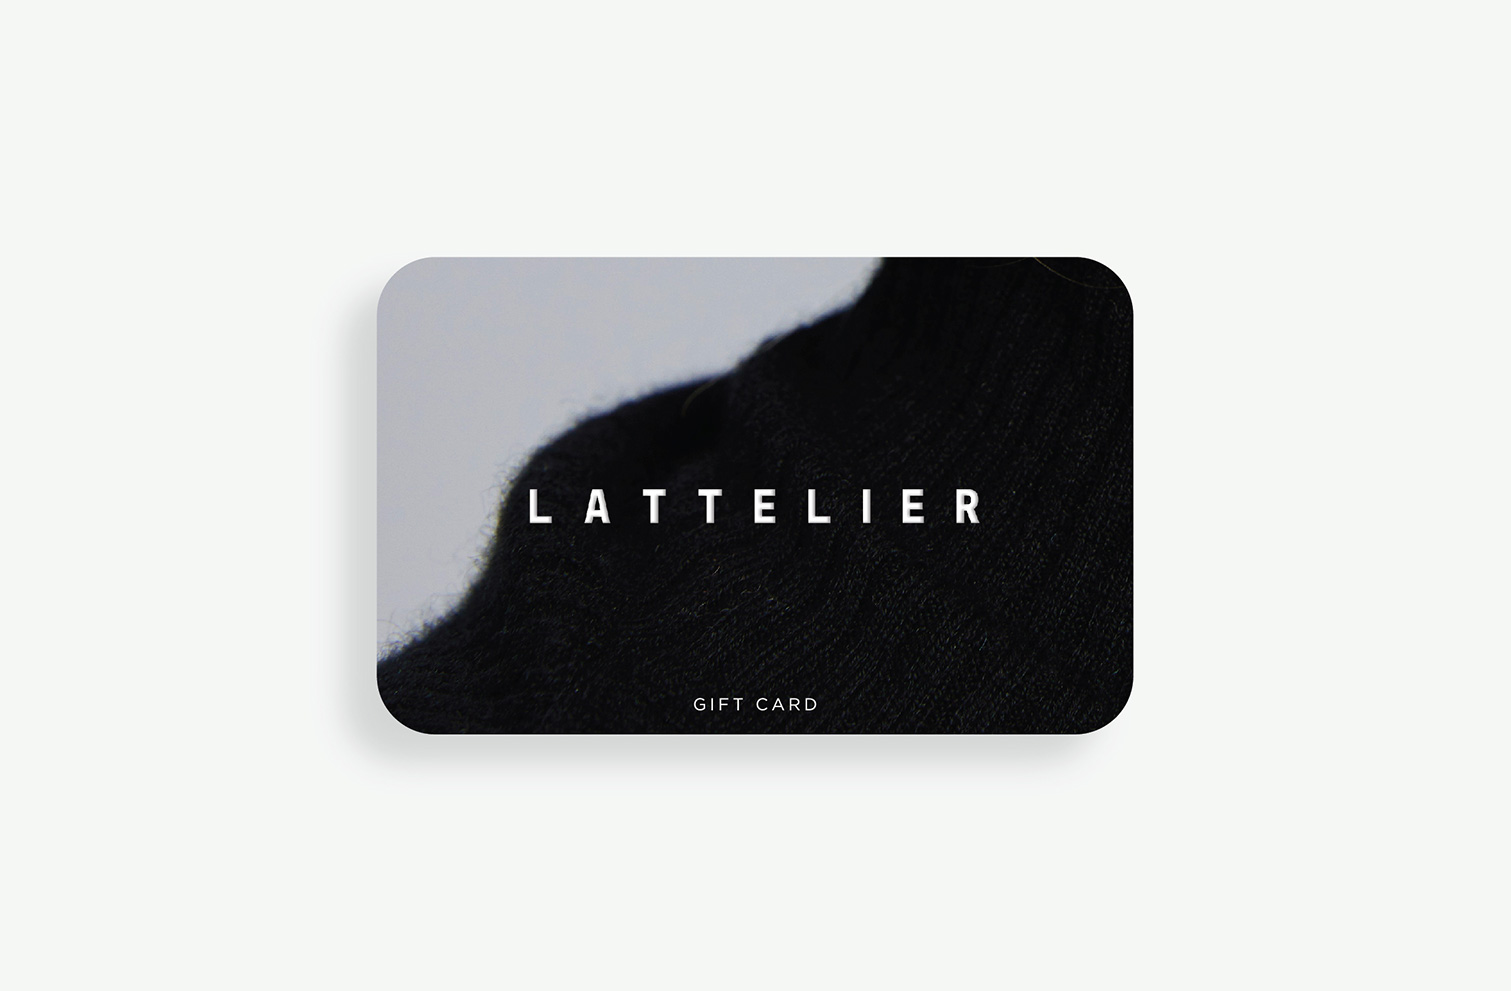 Latt gift card-50